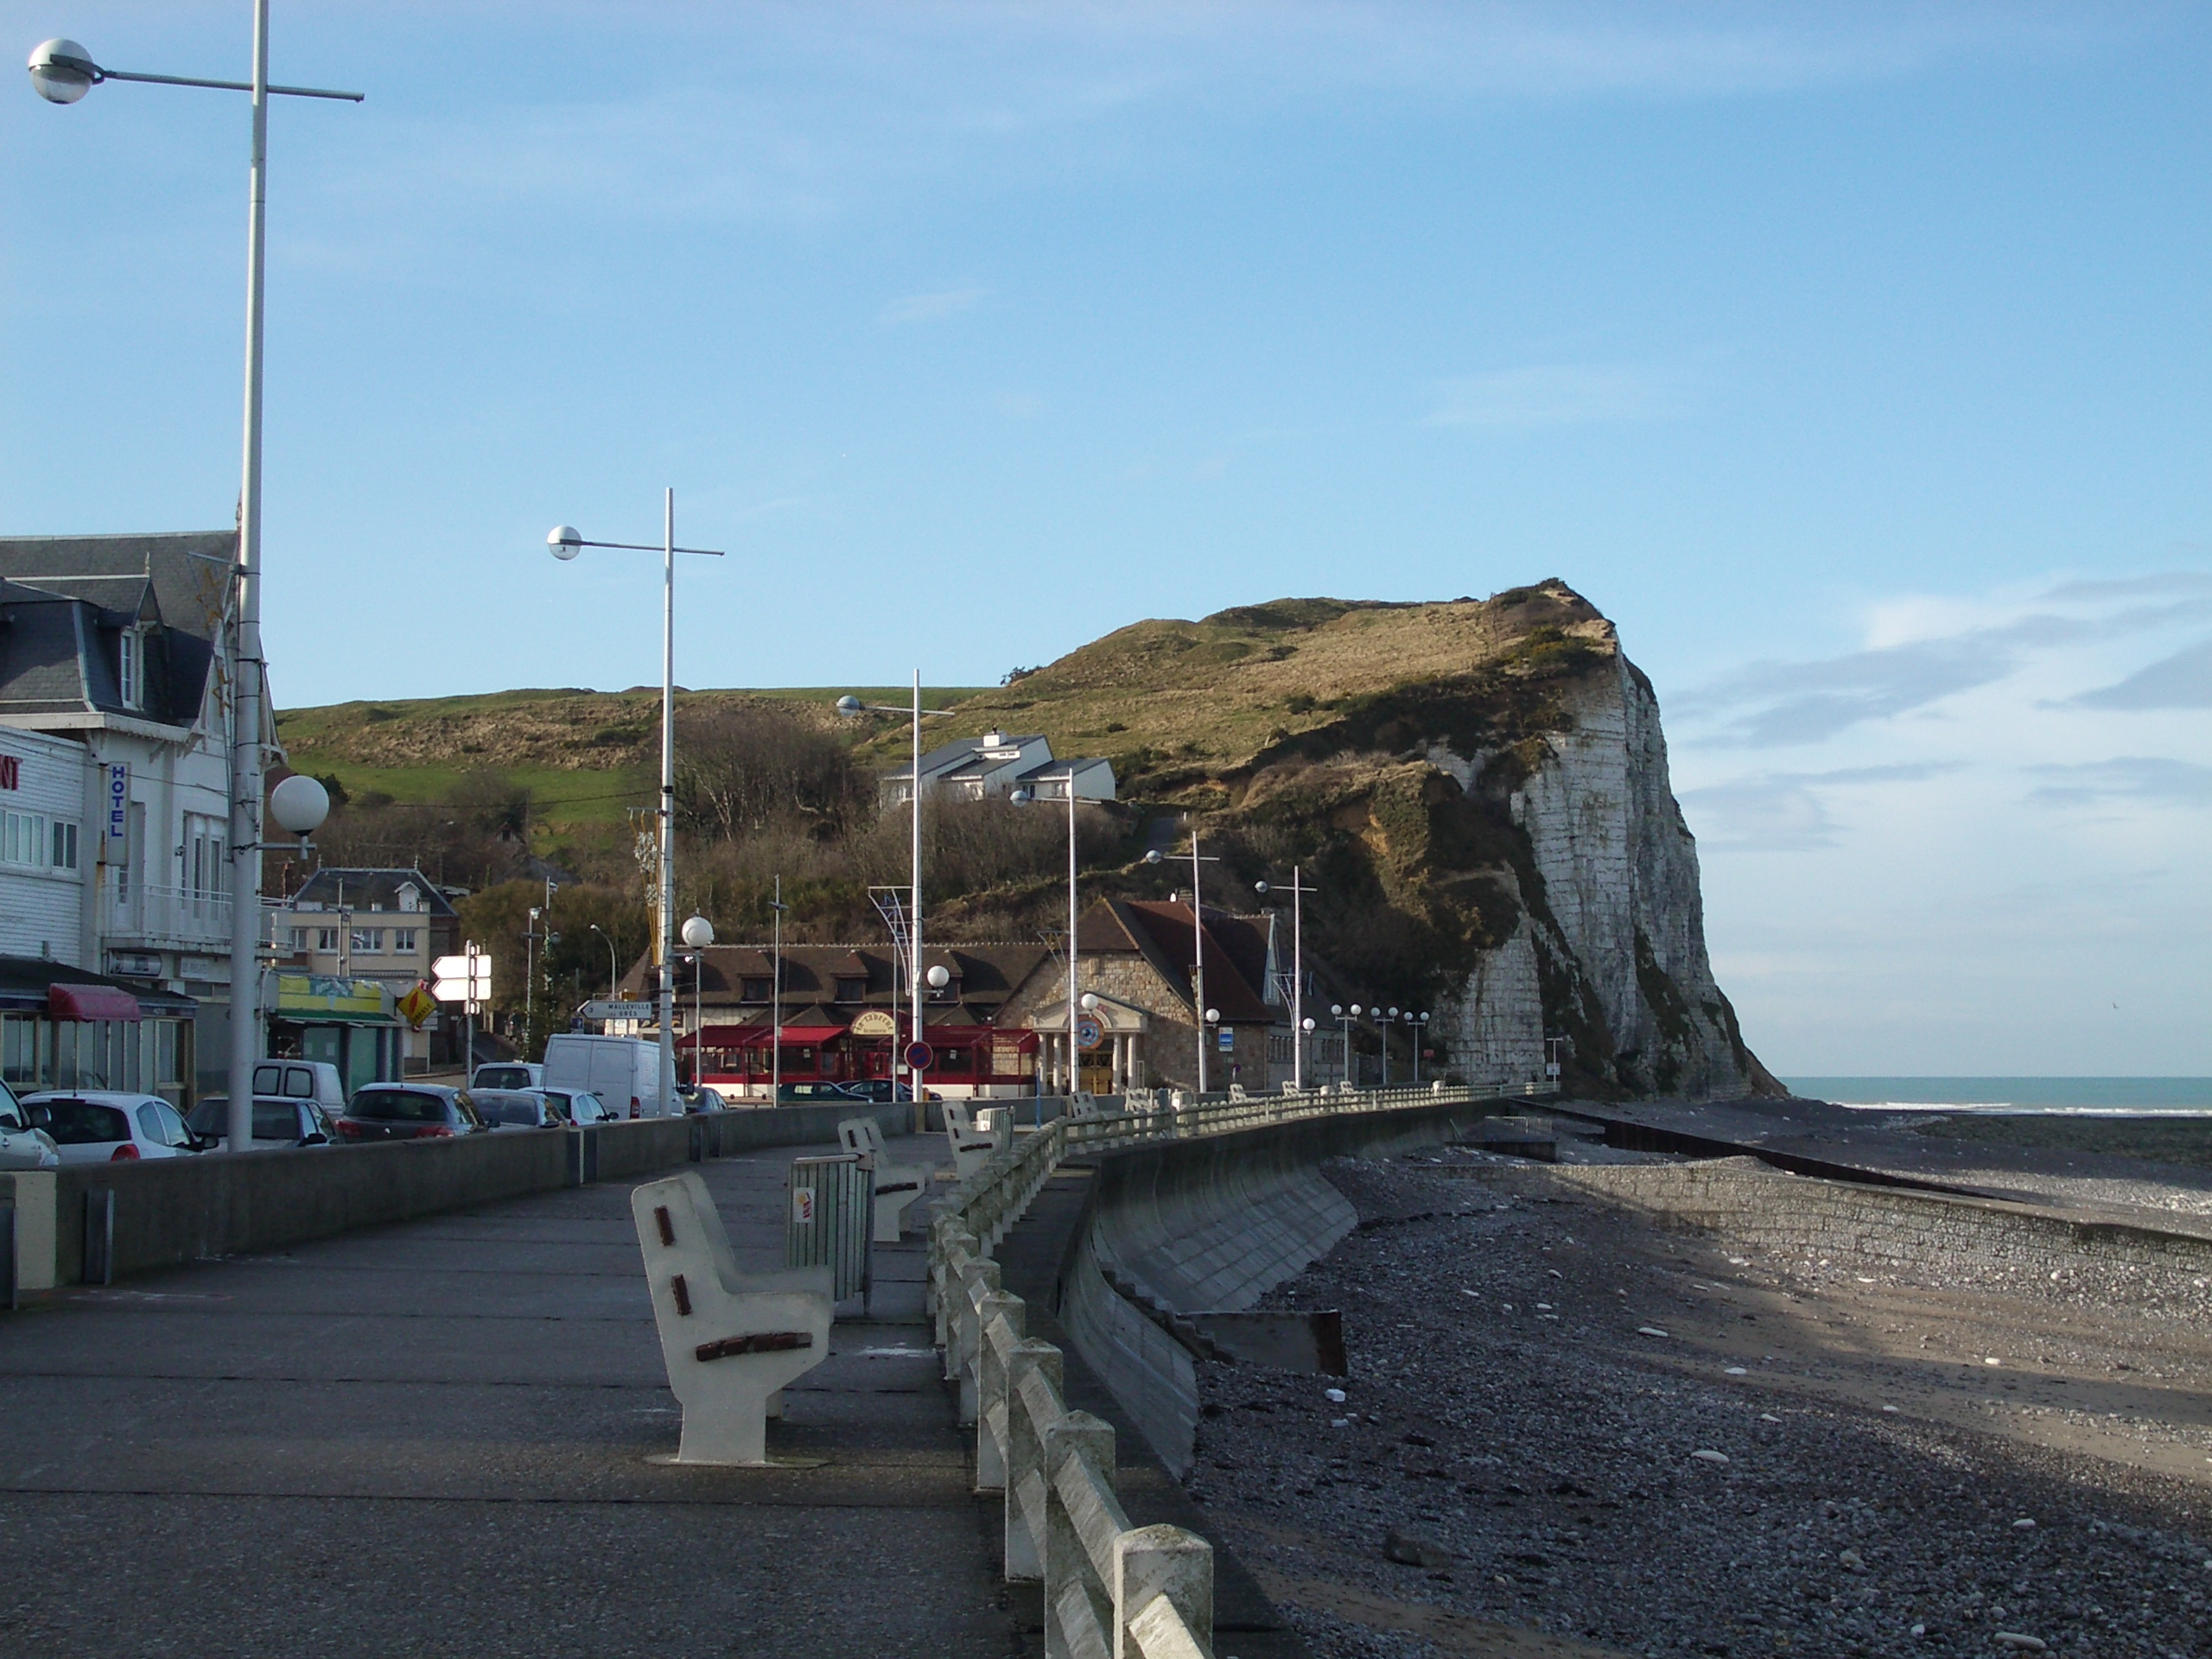 The cliffs of Veulettes